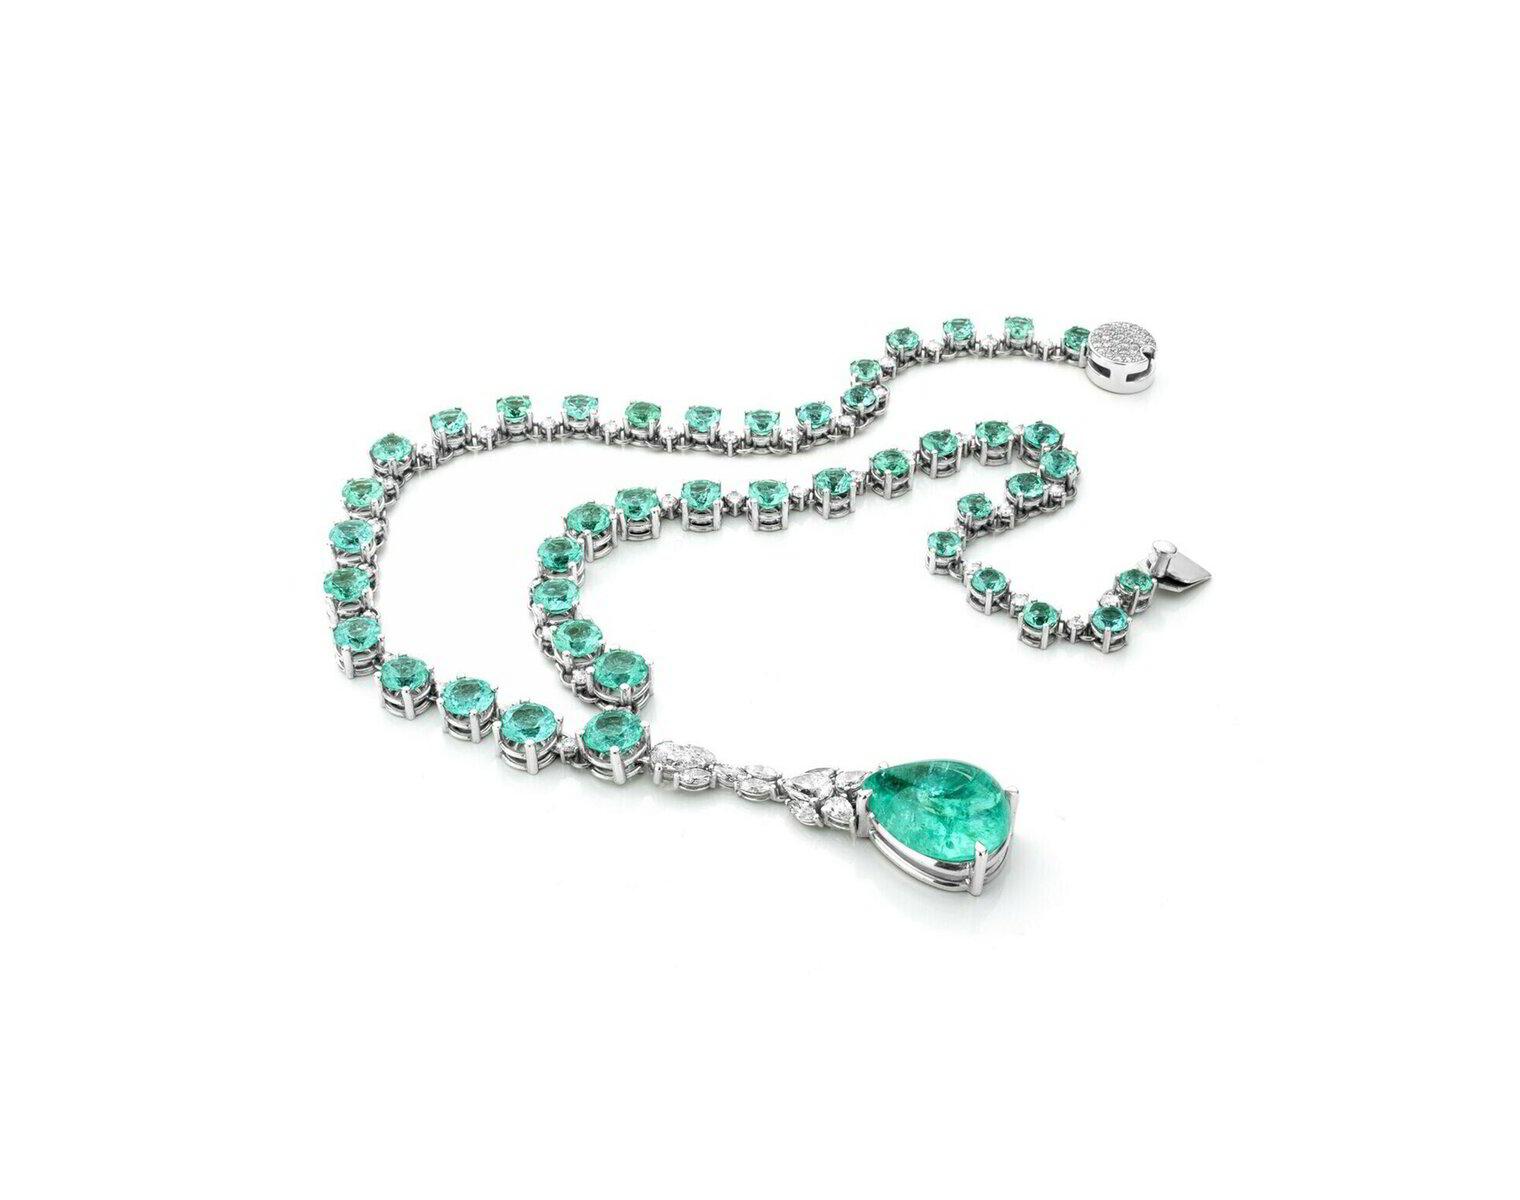 Spectacular Jewellery